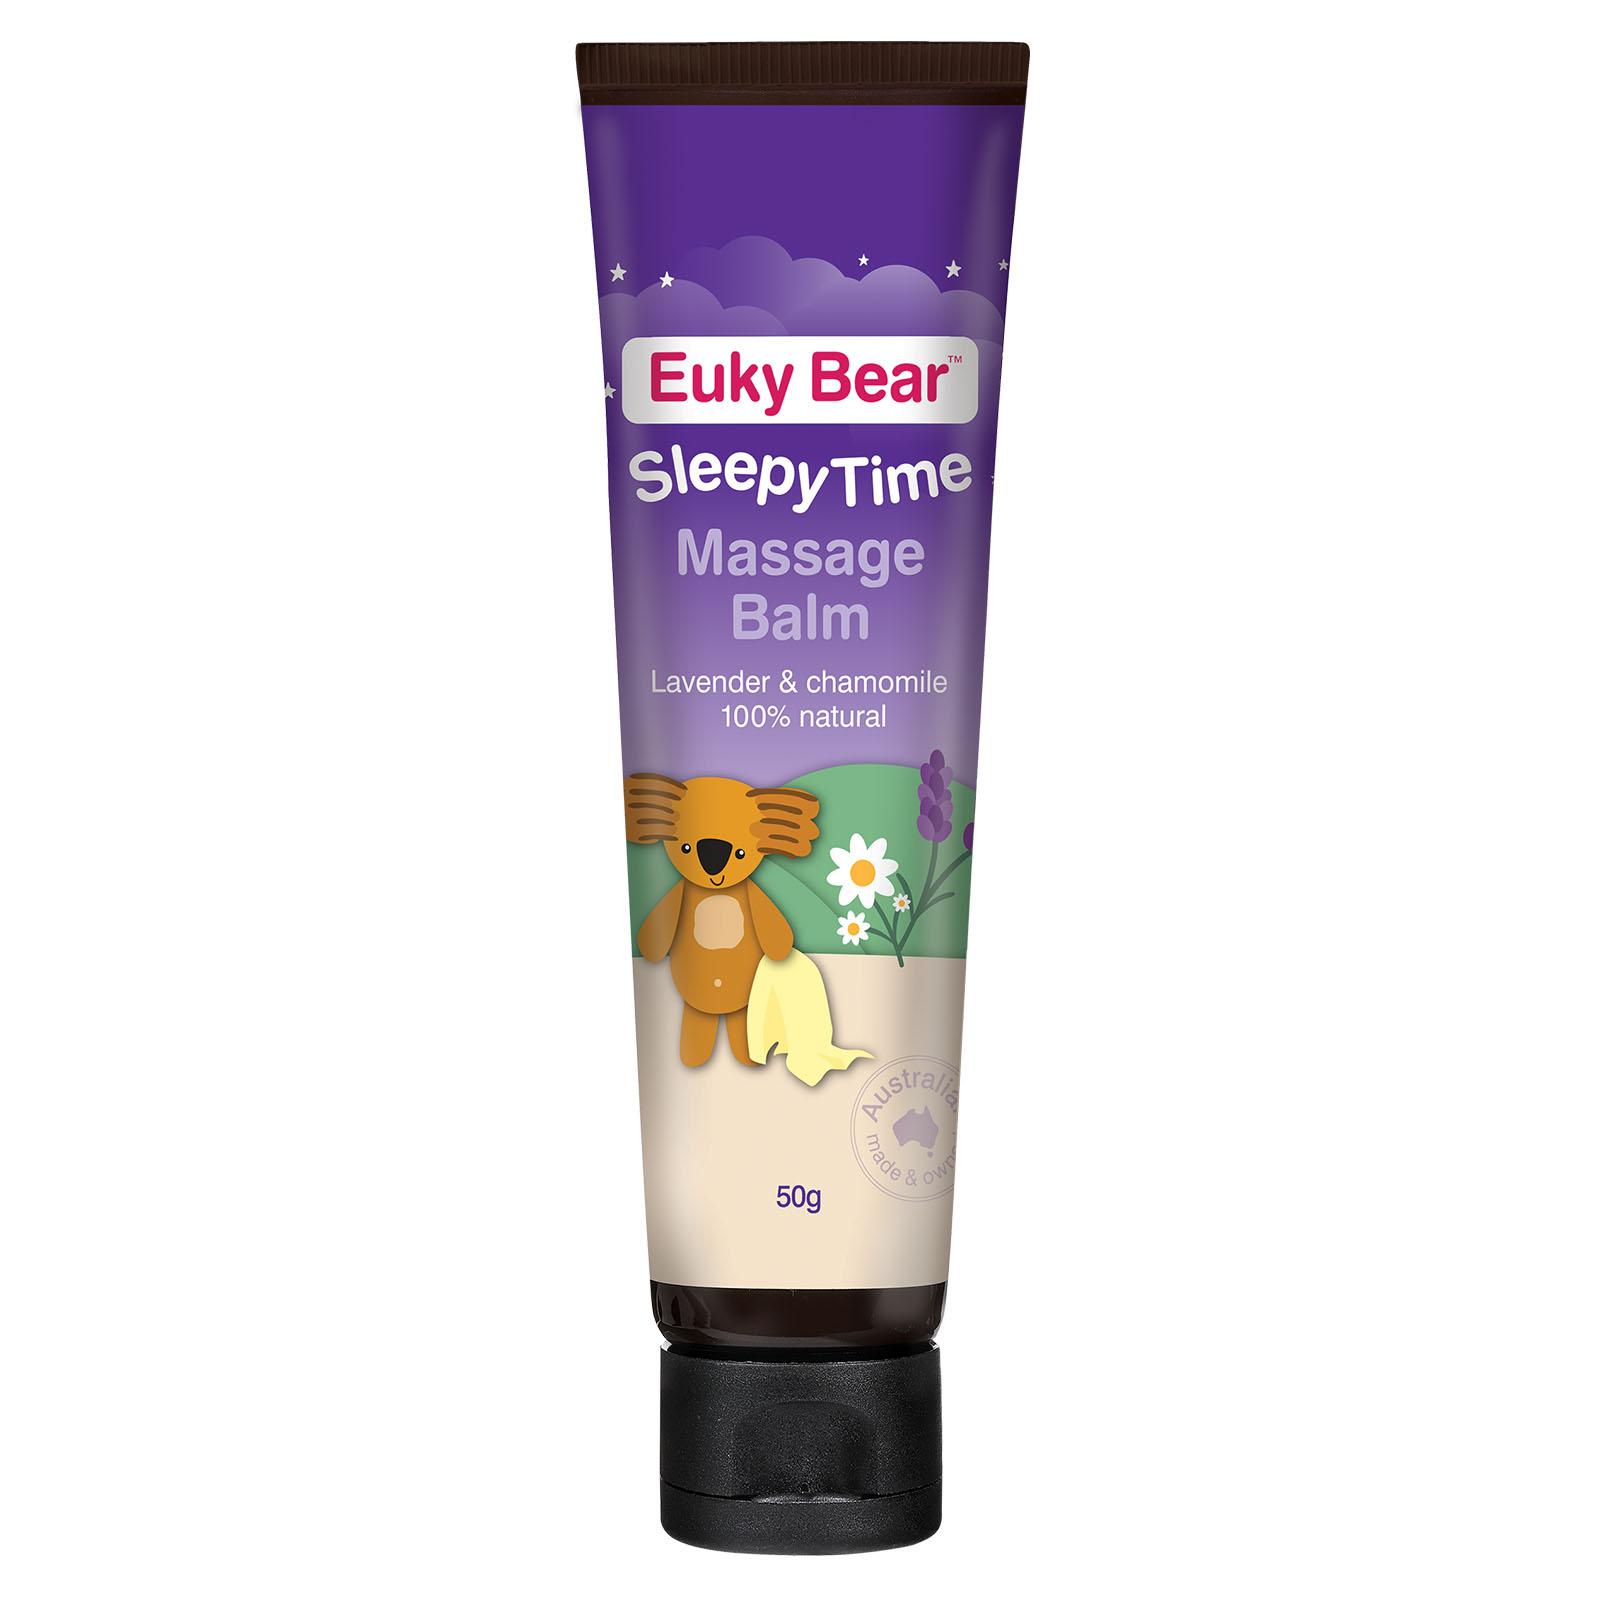 Euky Bear Sleepy Time Massage Balm 50g